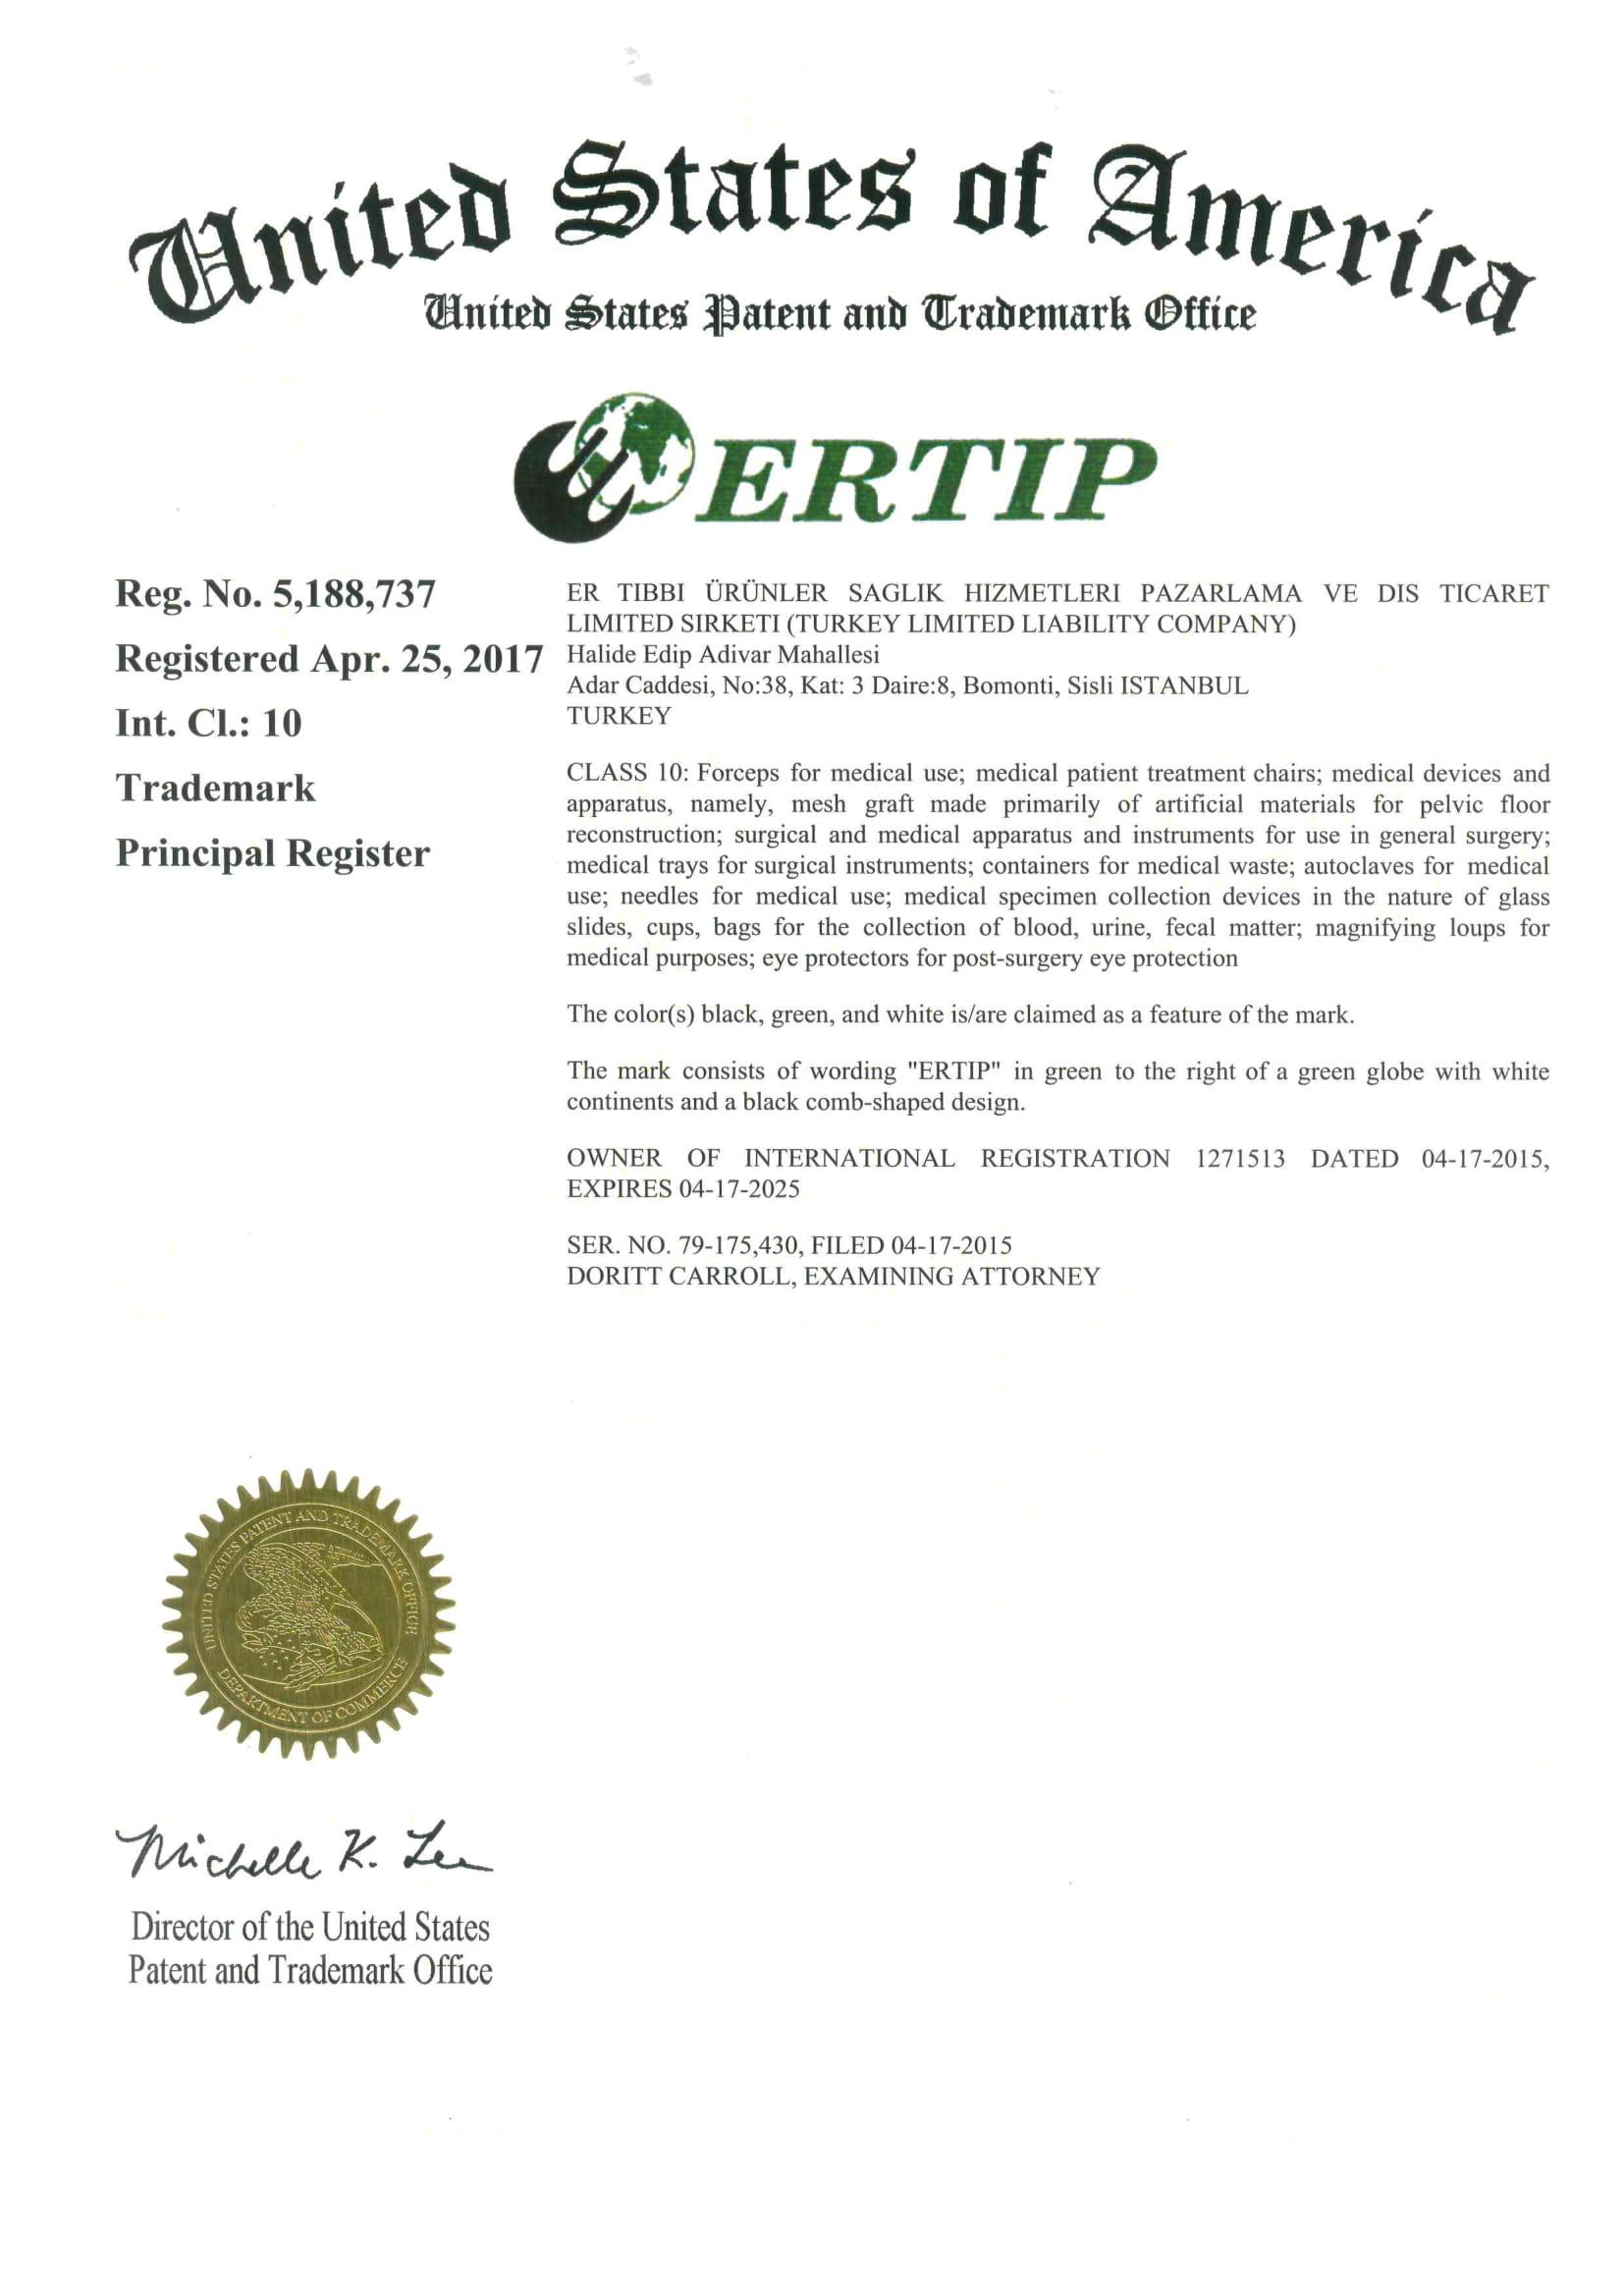 USA Trademark Registration Certificate